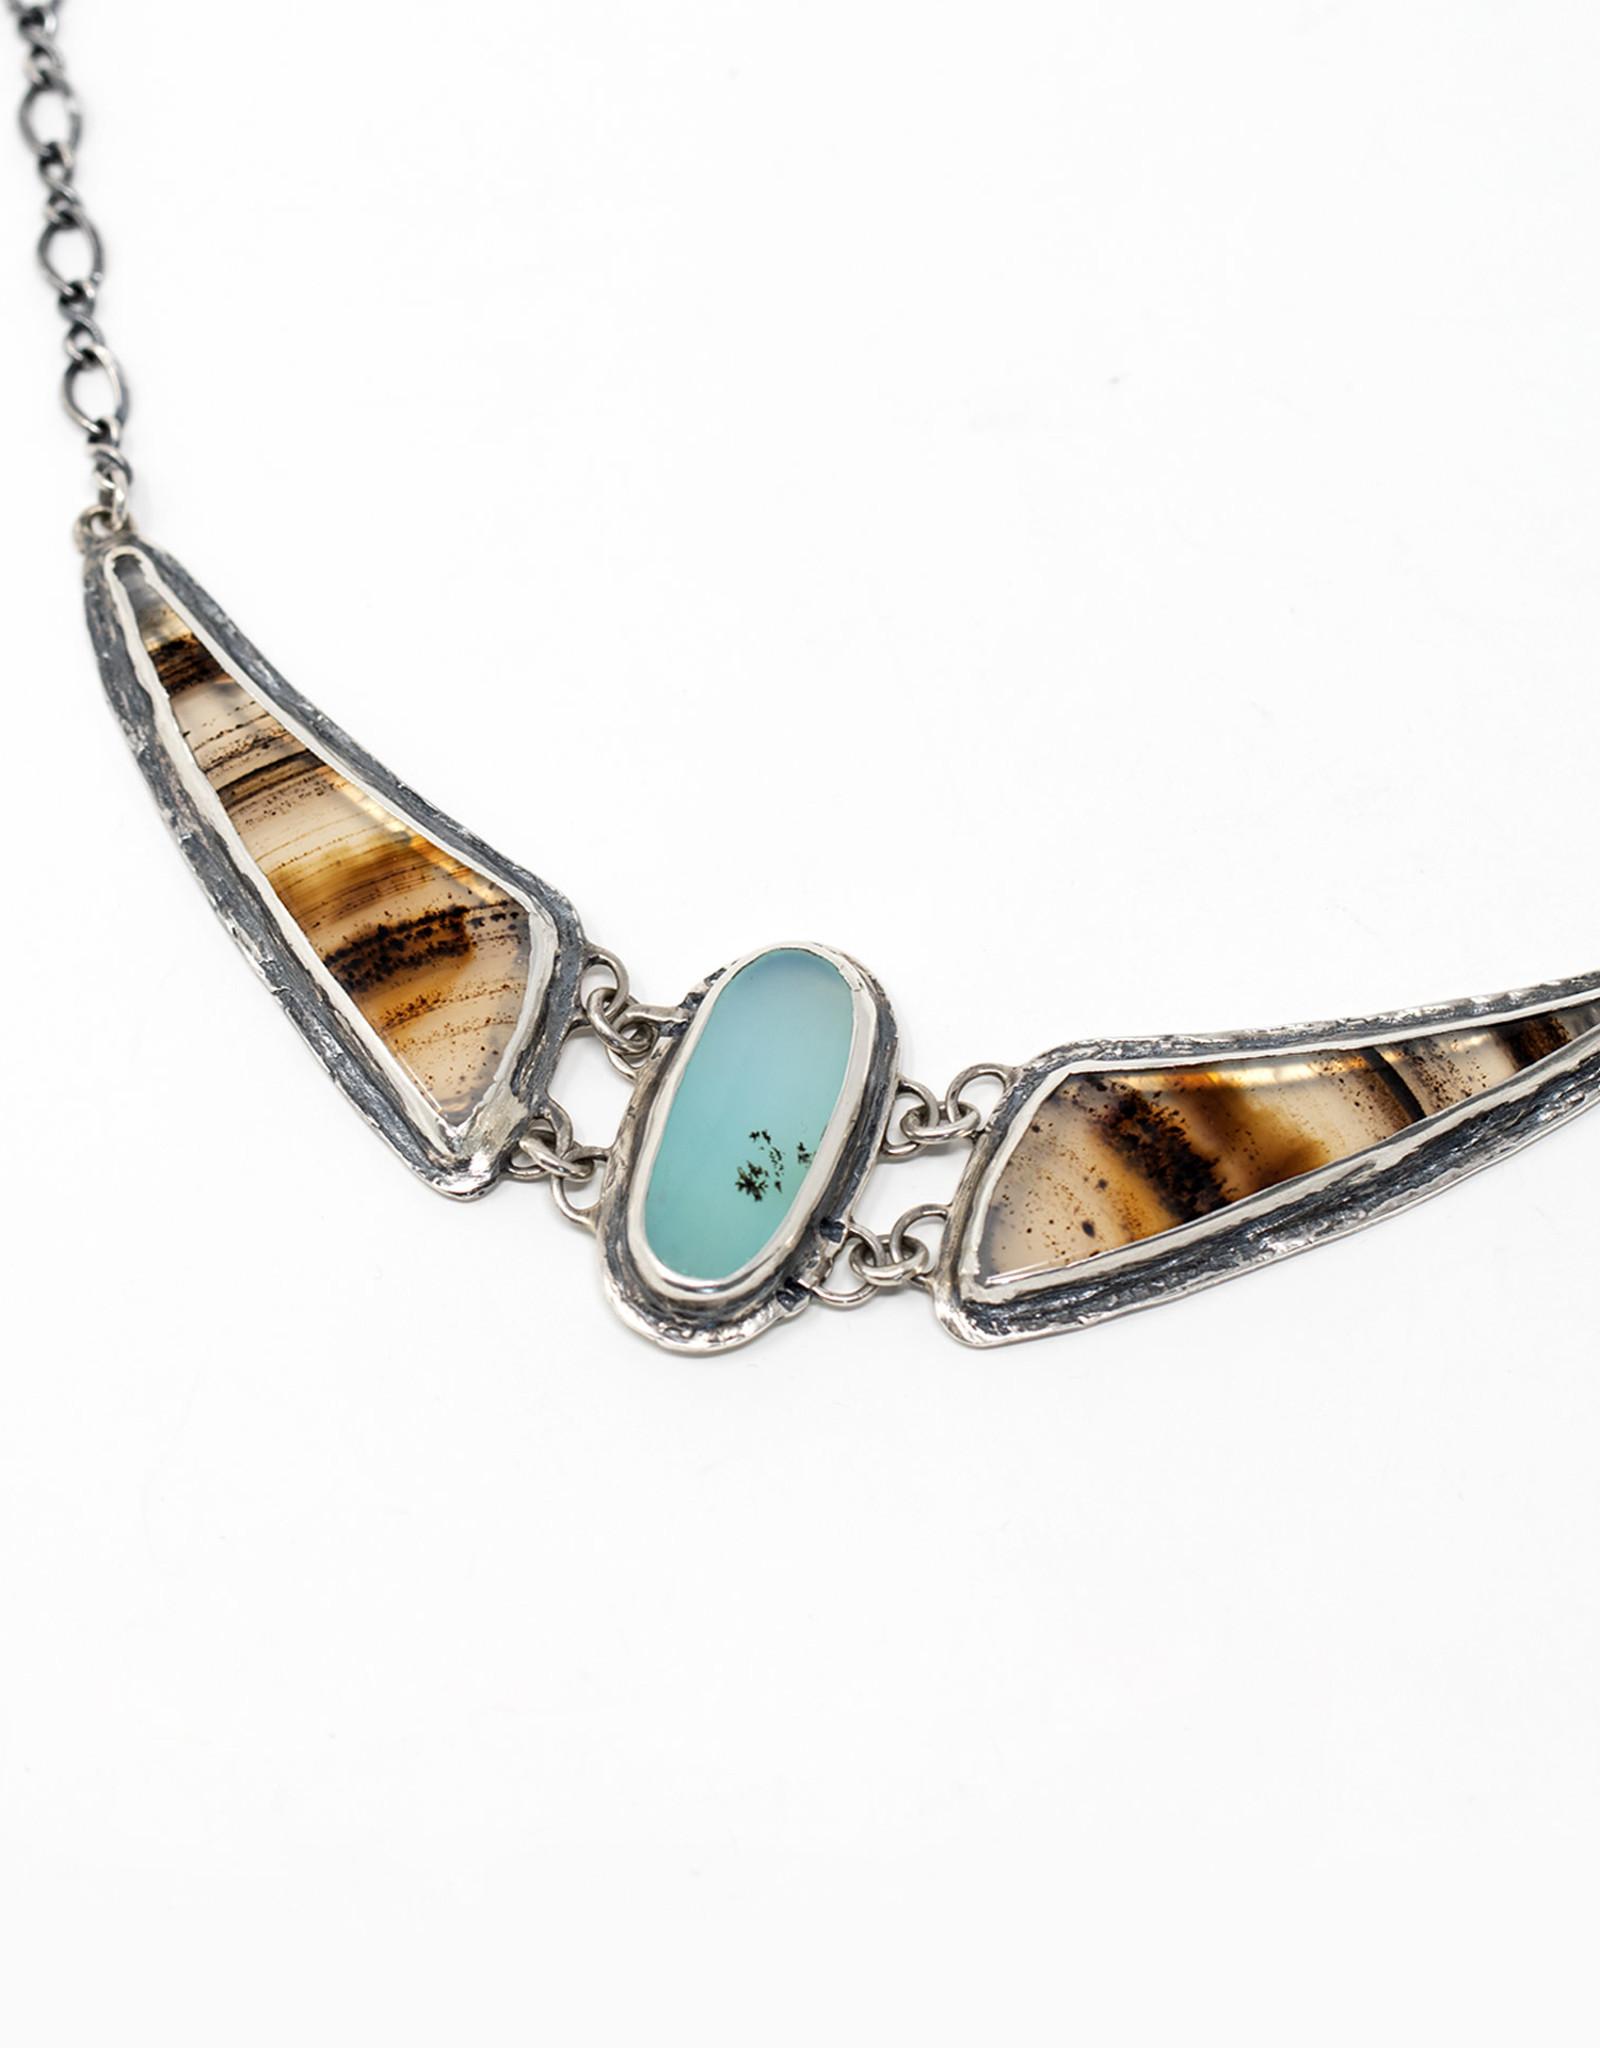 August Hess August Hess/Peruvian Opal and Montana Agate Choker Necklace